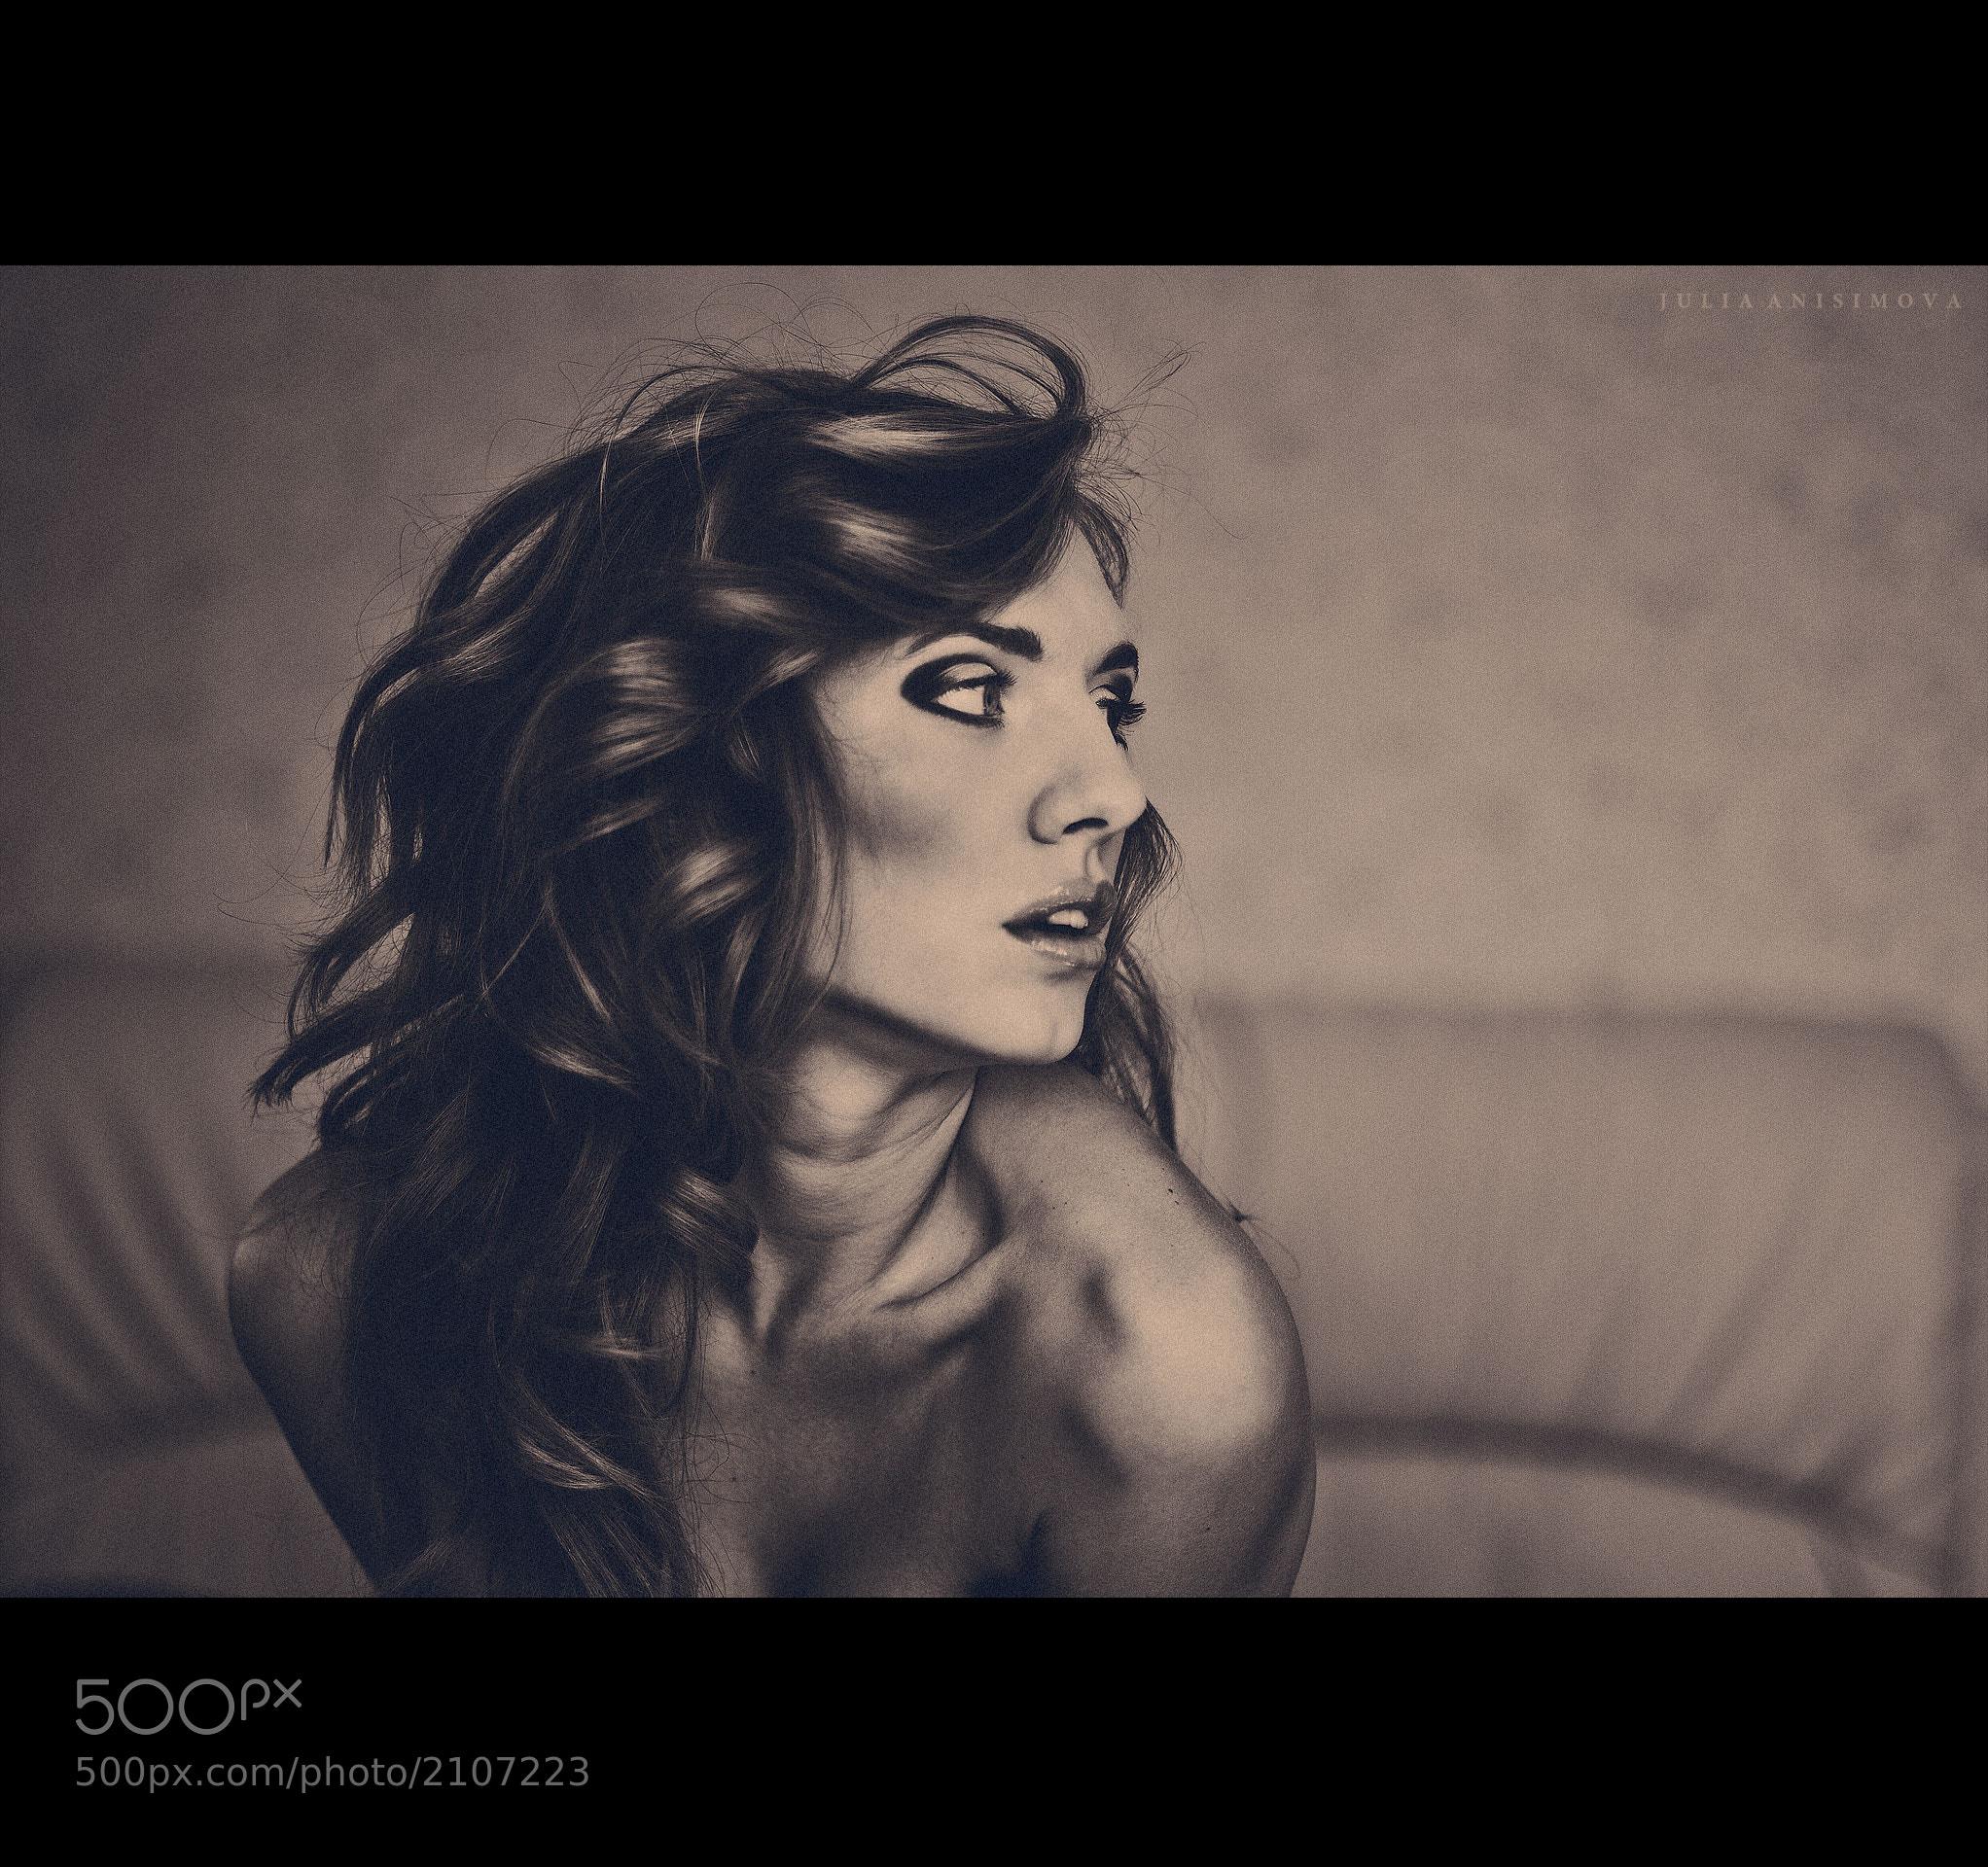 Photograph sex by julia anisimova  on 500px